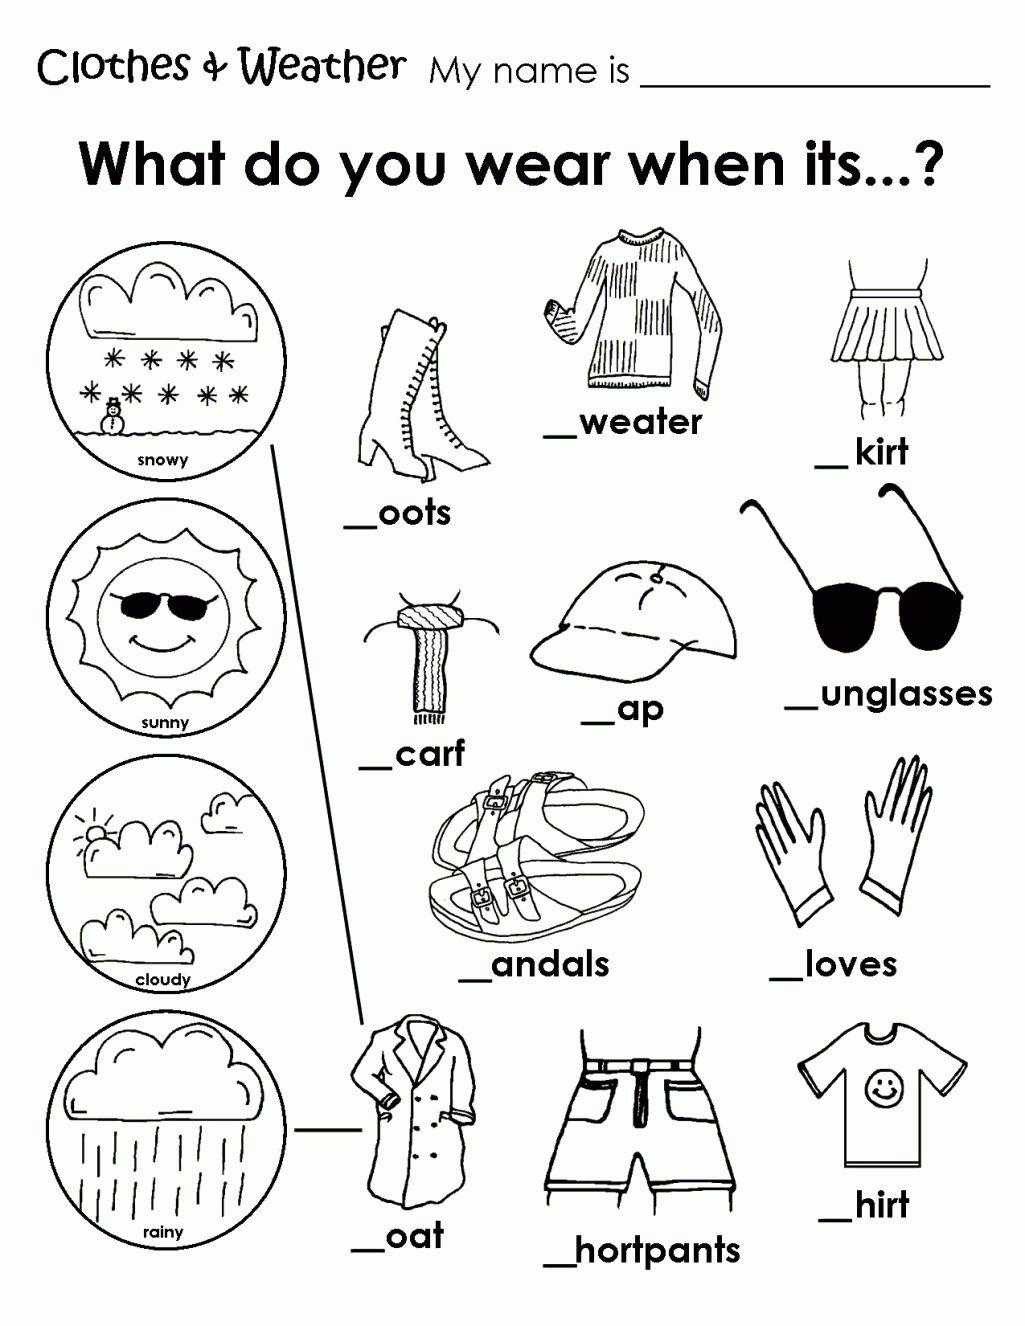 Printable Weather Clothes Worksheet | Memory Care Activities - Free Printable Seasons Worksheets For Kindergarten